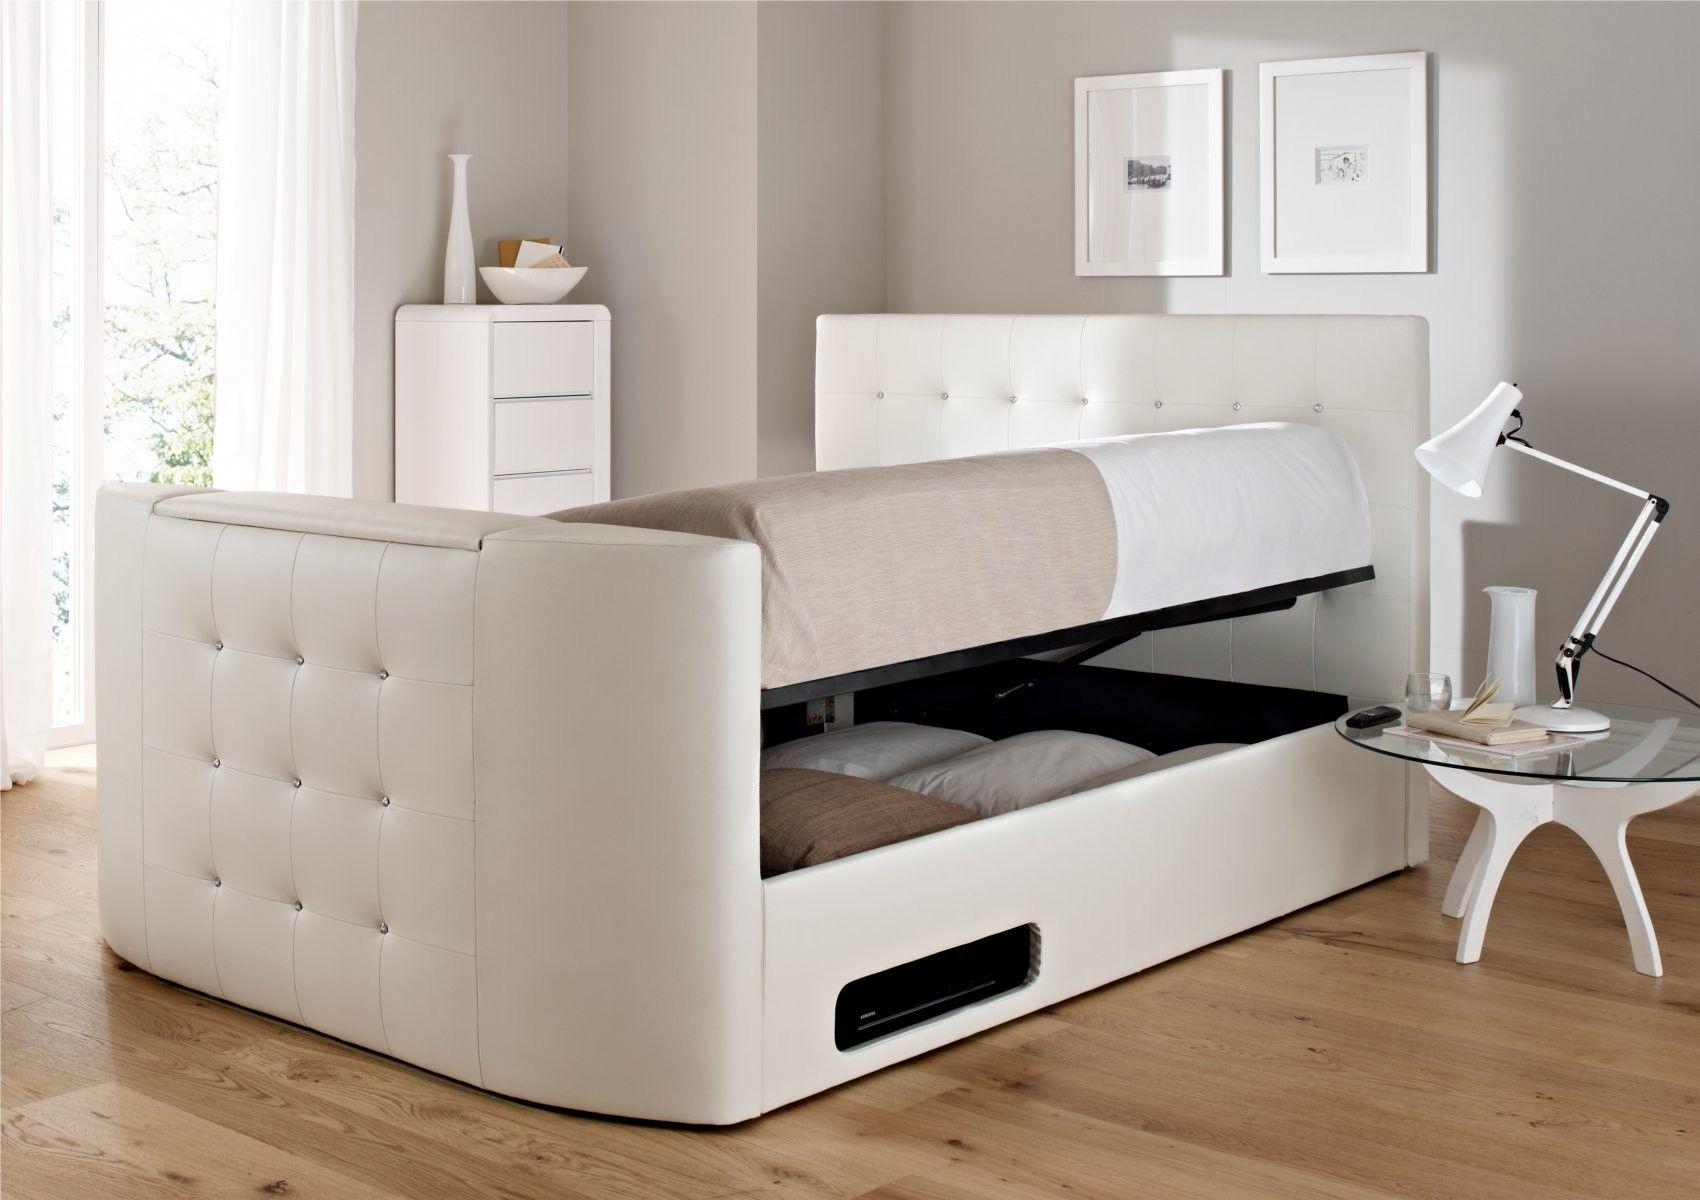 Prime Atlantis Leather Ottoman Tv Bed White Ottoman Beds Machost Co Dining Chair Design Ideas Machostcouk